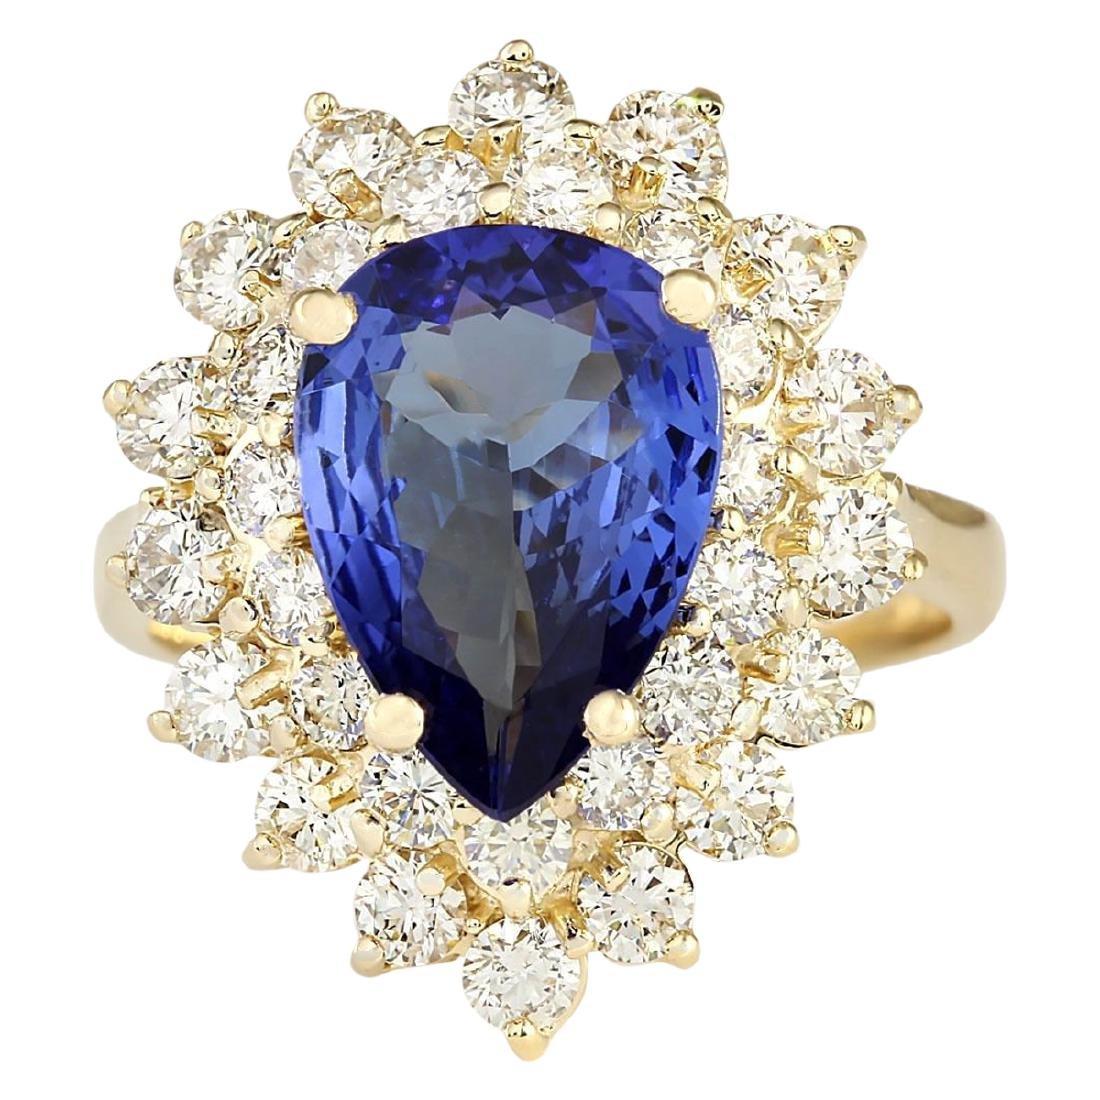 4.73 CTW Natural Blue Tanzanite And Diamond Ring 18K